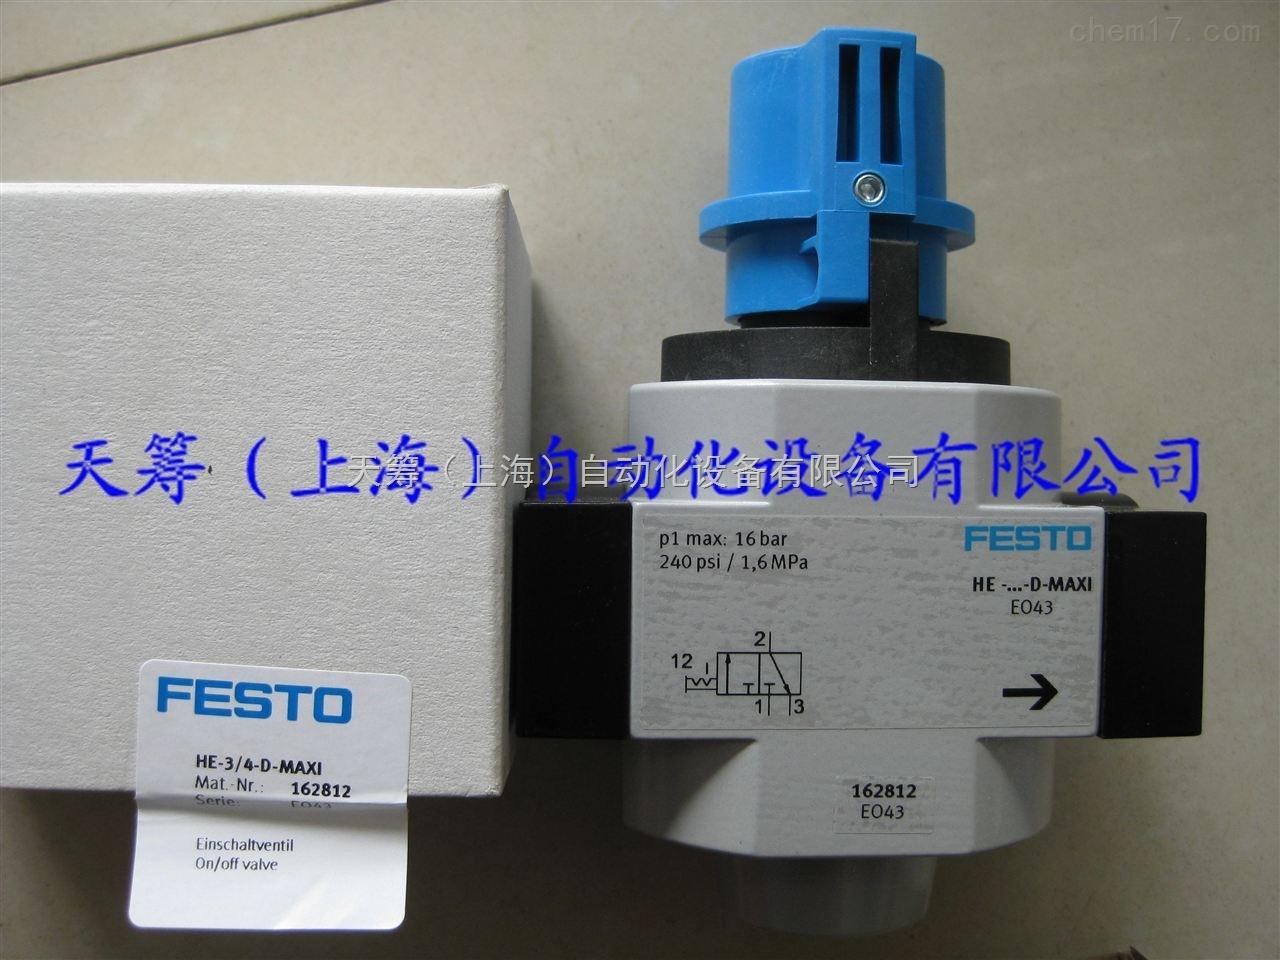 FESTO软启动阀HE-3/4-D-MAXI